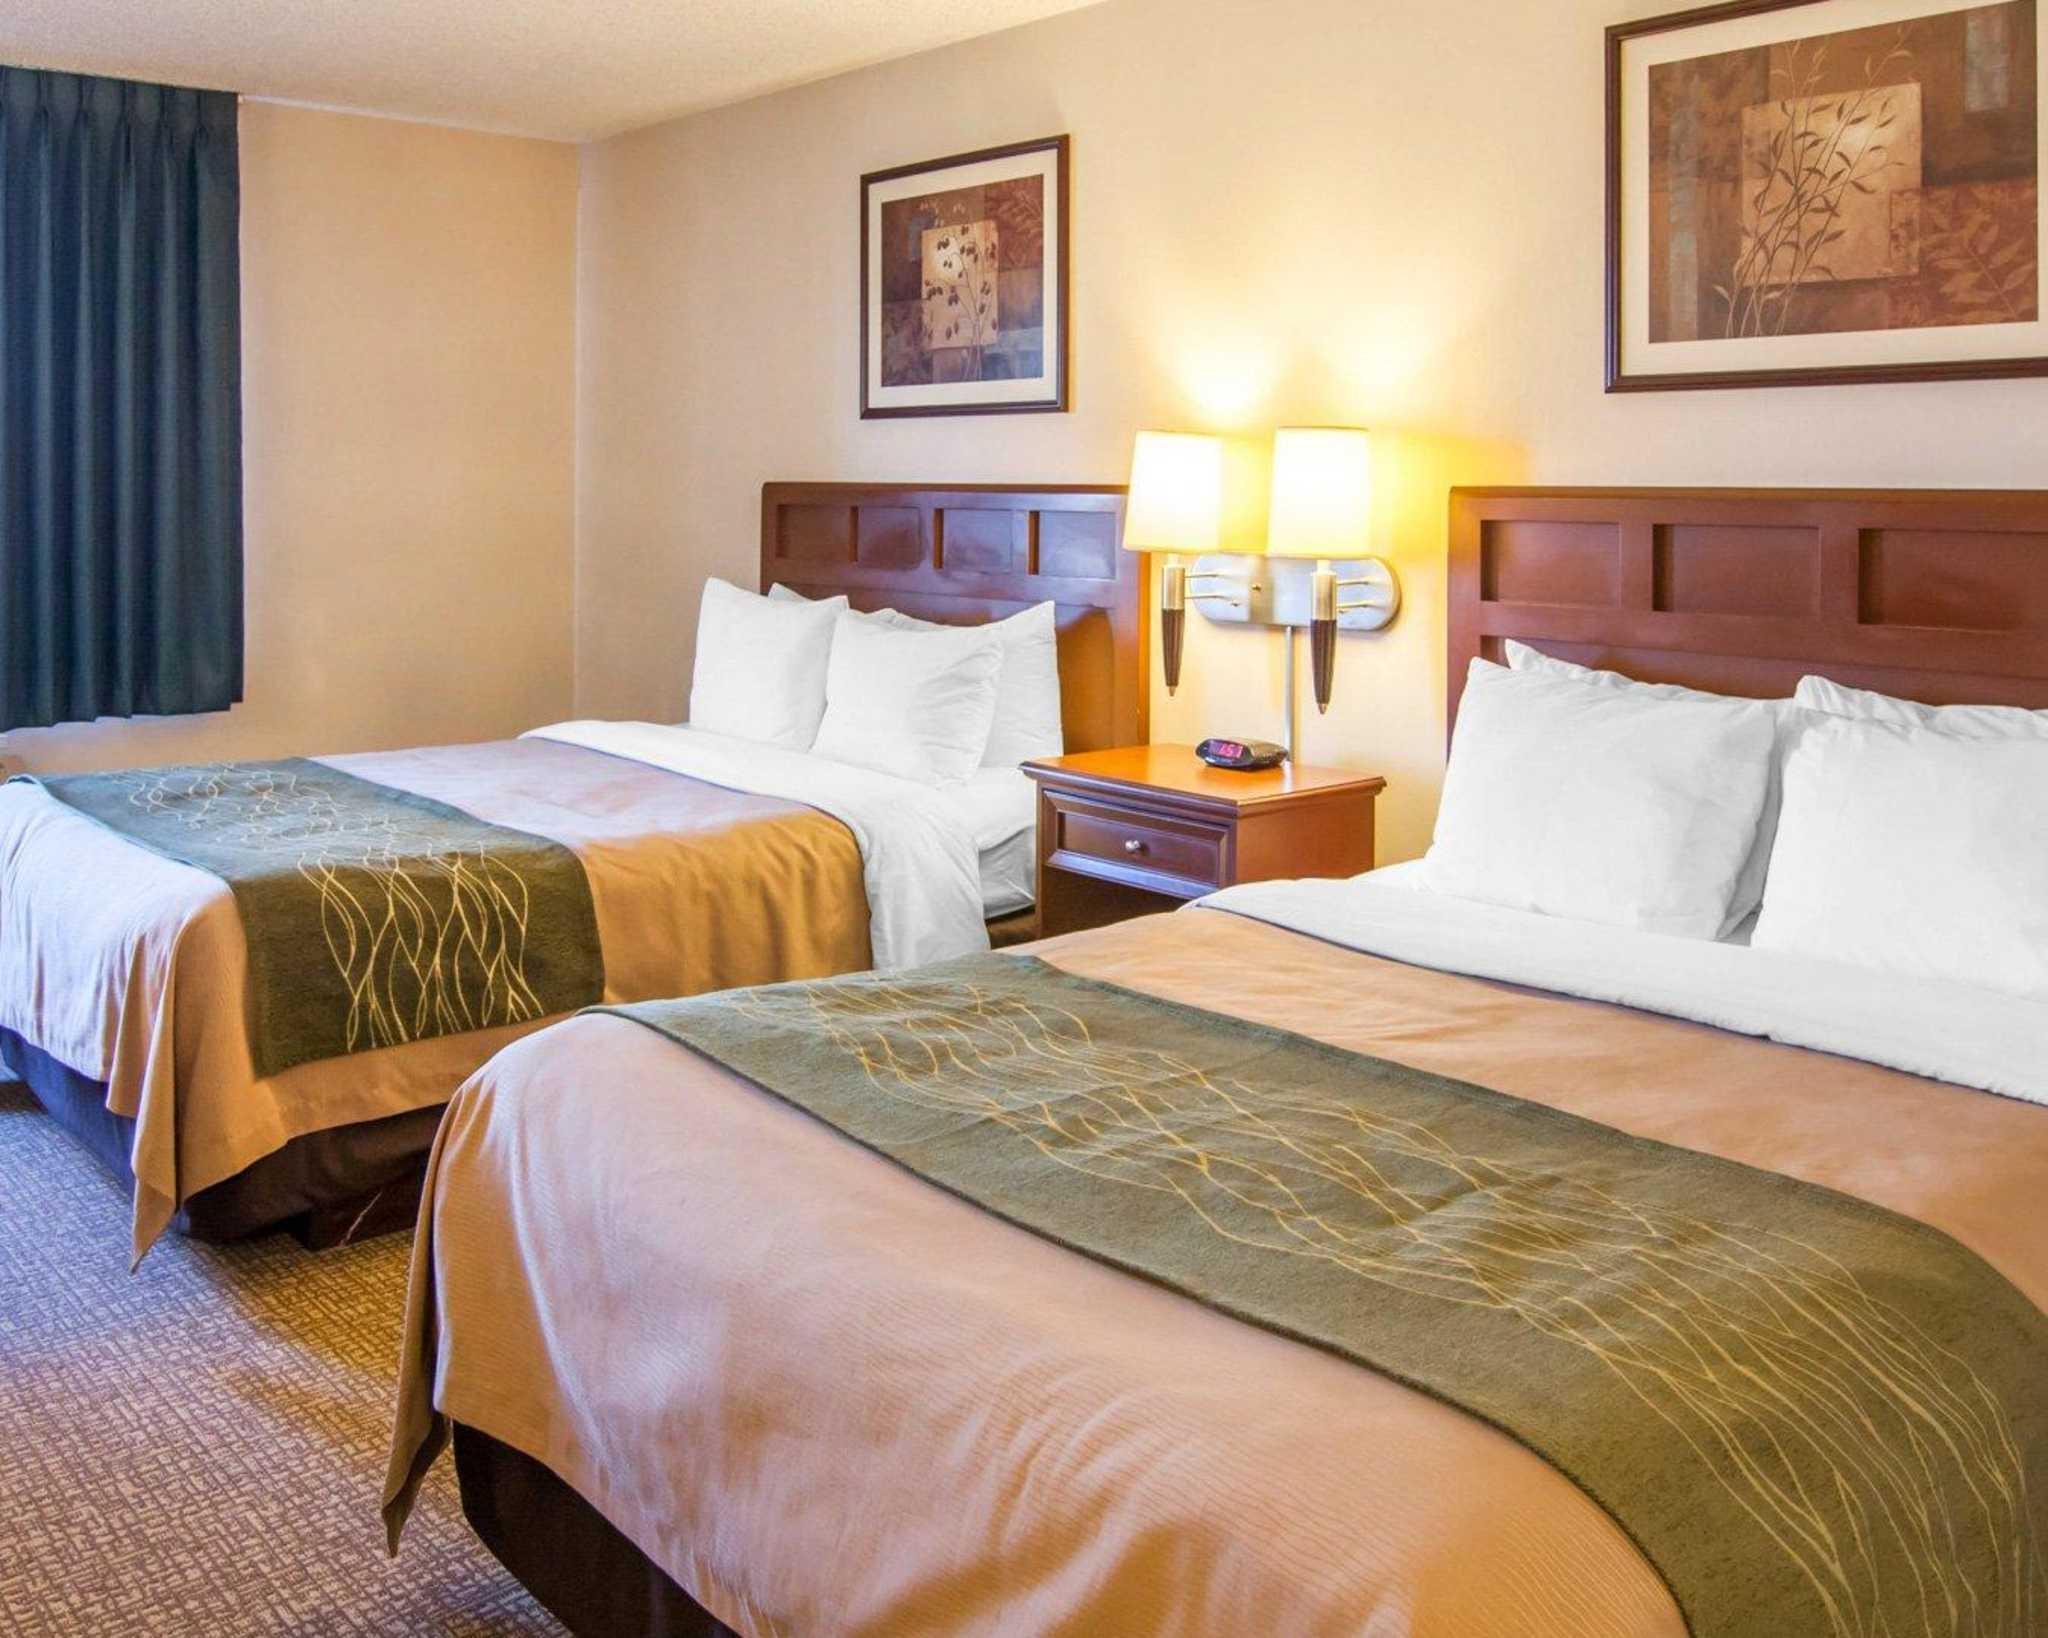 Comfort Inn North image 13